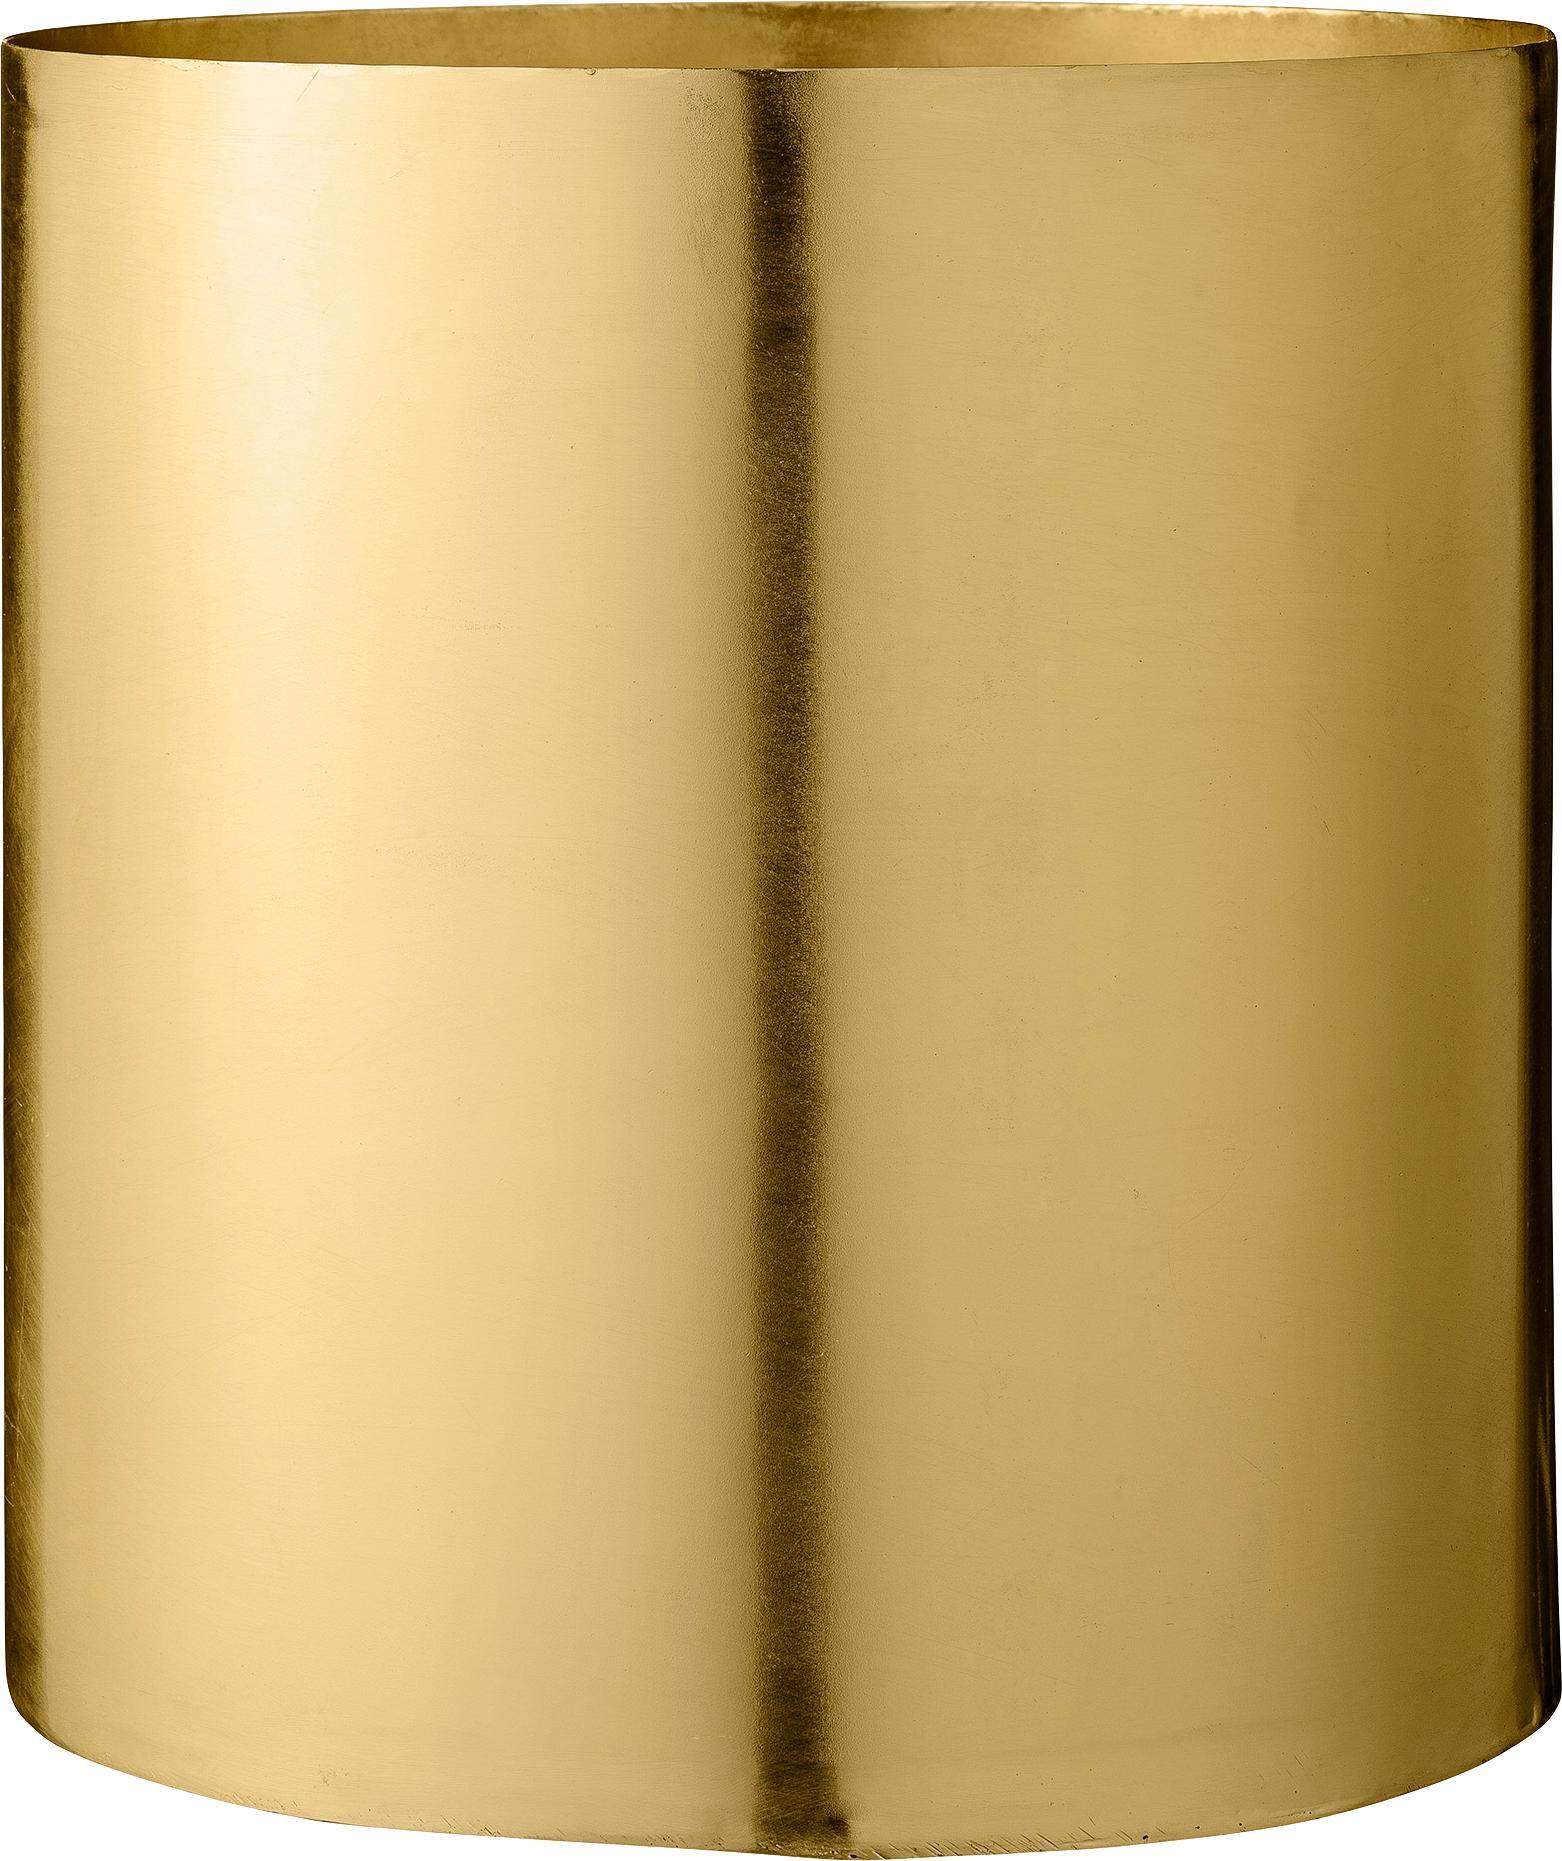 Übertopf Sharin, Metall, vermessingt, Messing, Ø 22 x H 23 cm